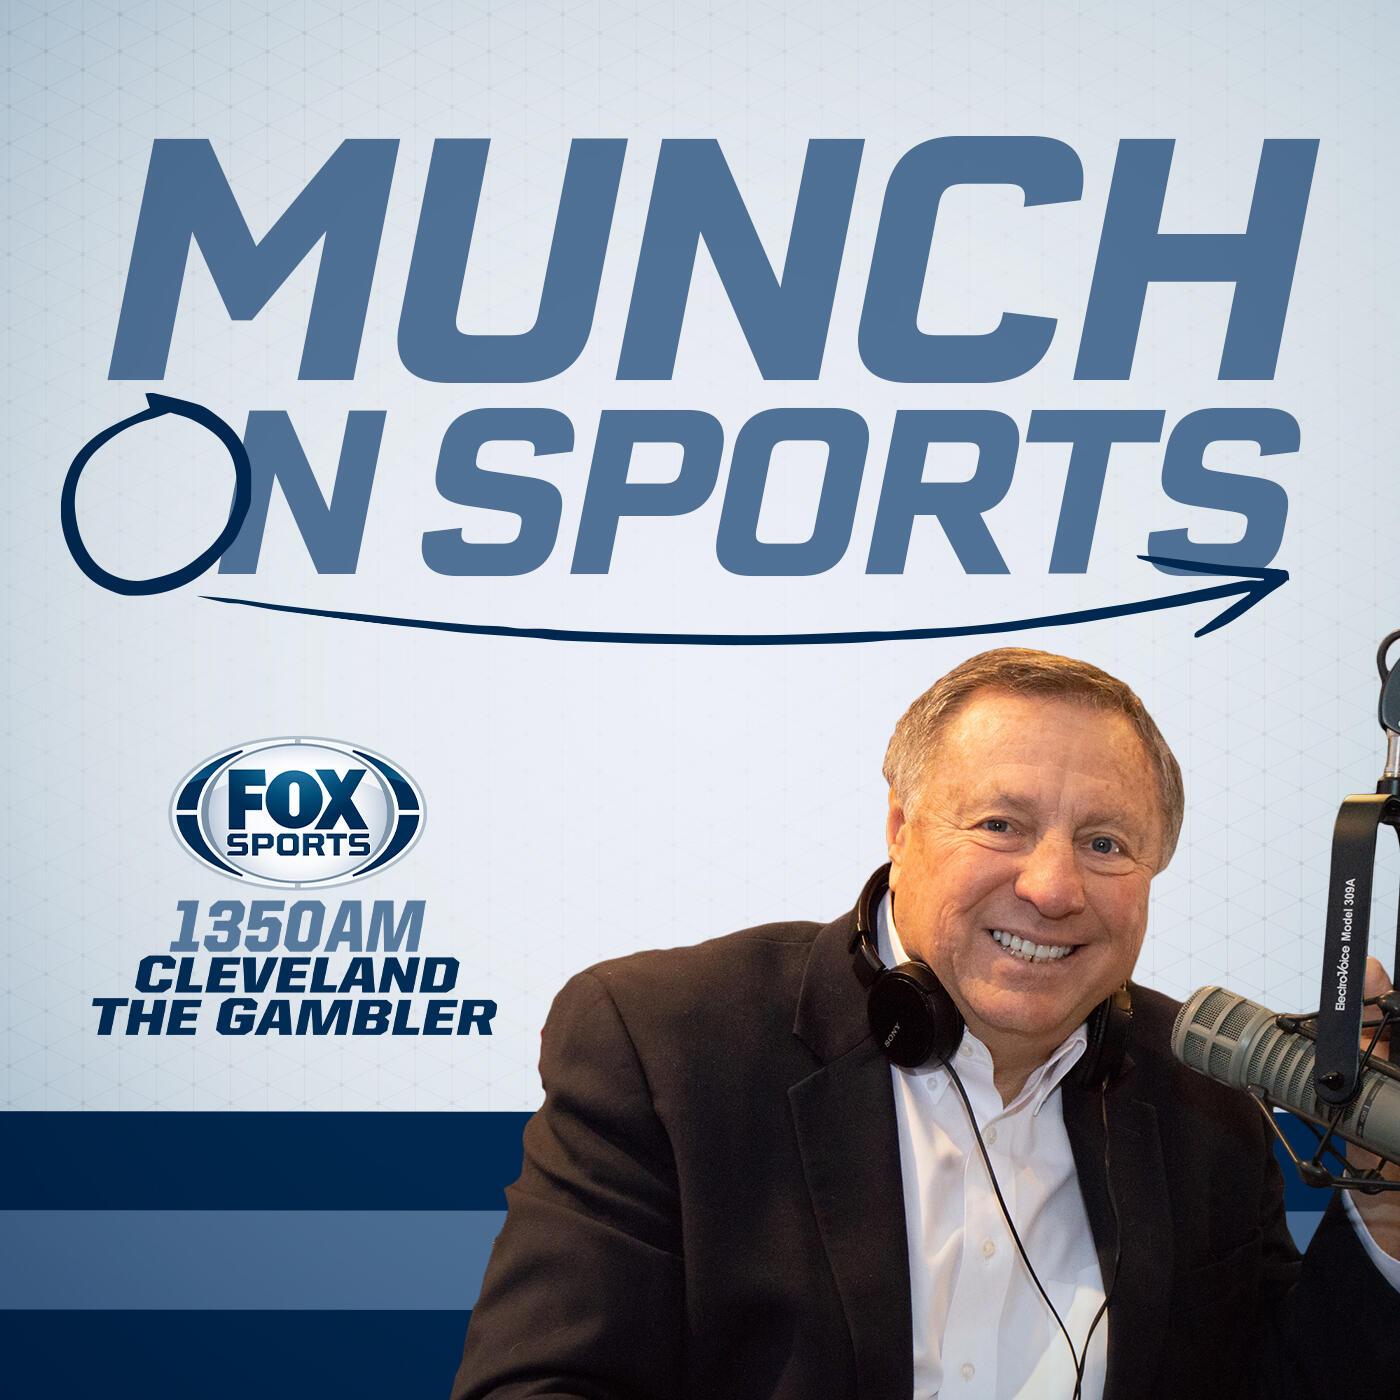 Munch On Sports